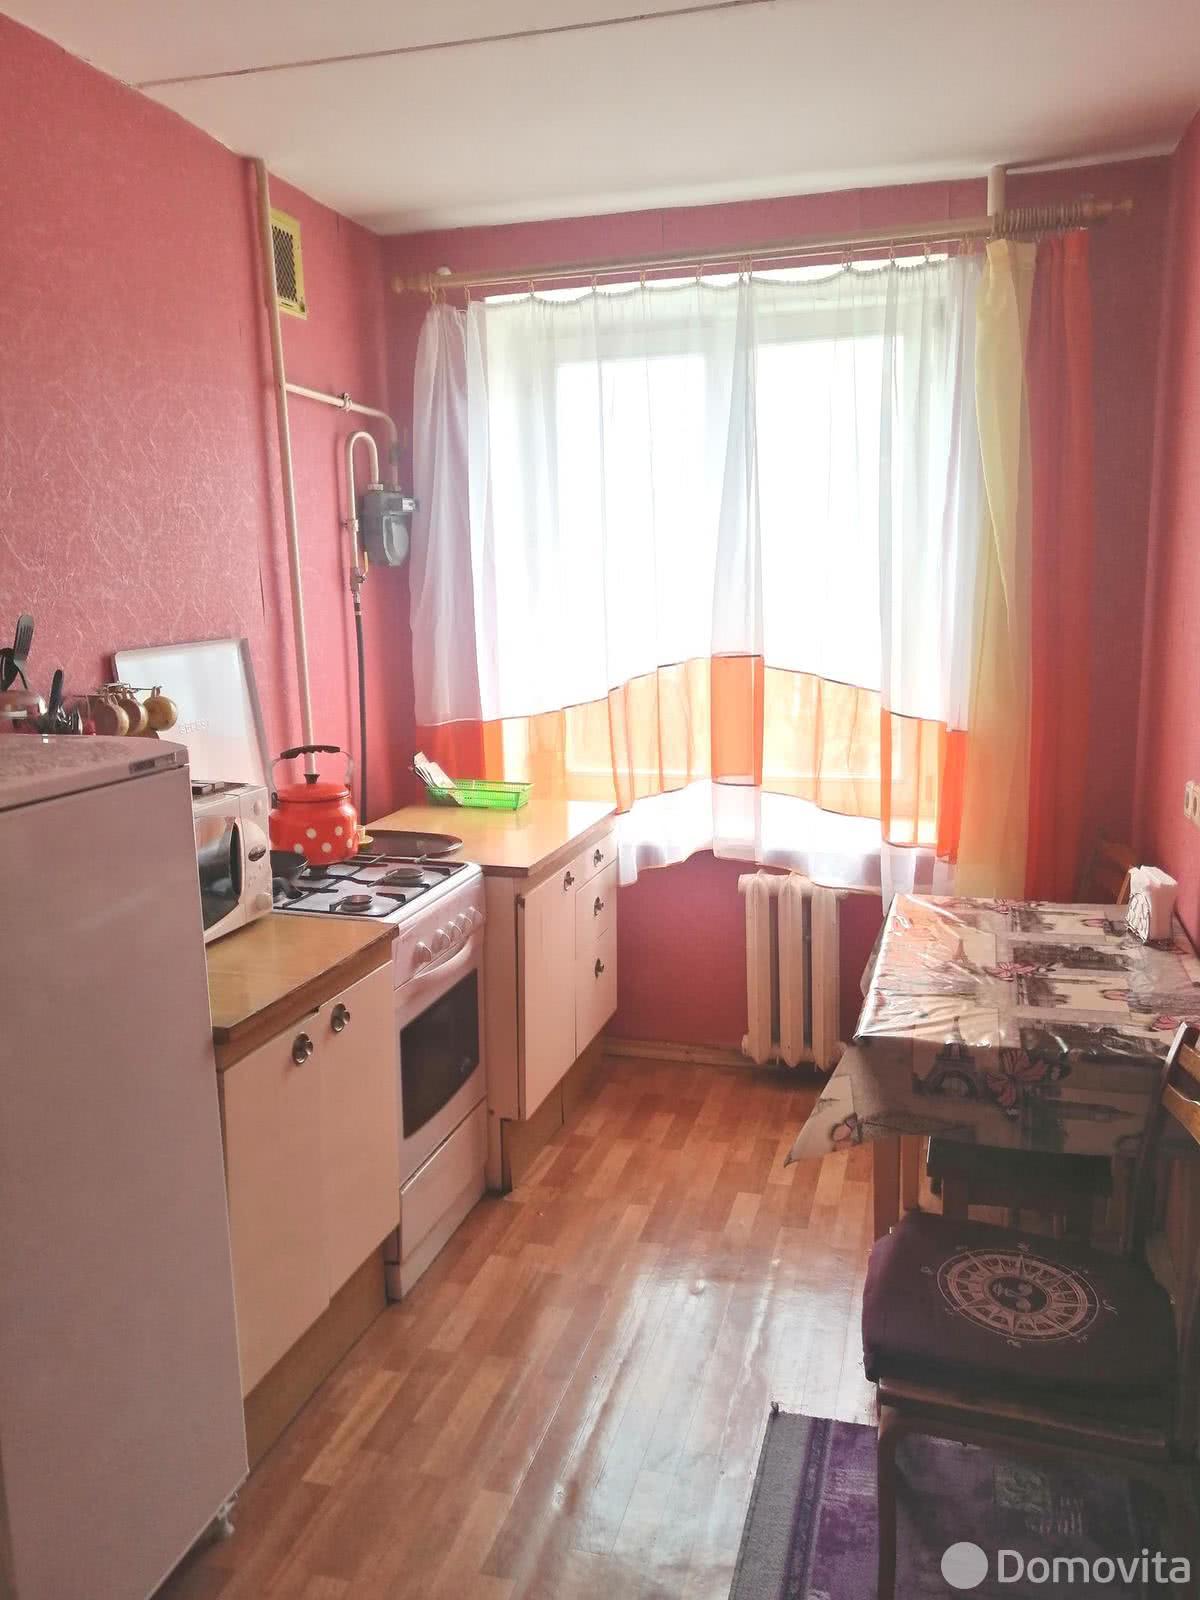 Аренда 1-комнатной квартиры на сутки в Минске ул. Немига, д. 10 - фото 3